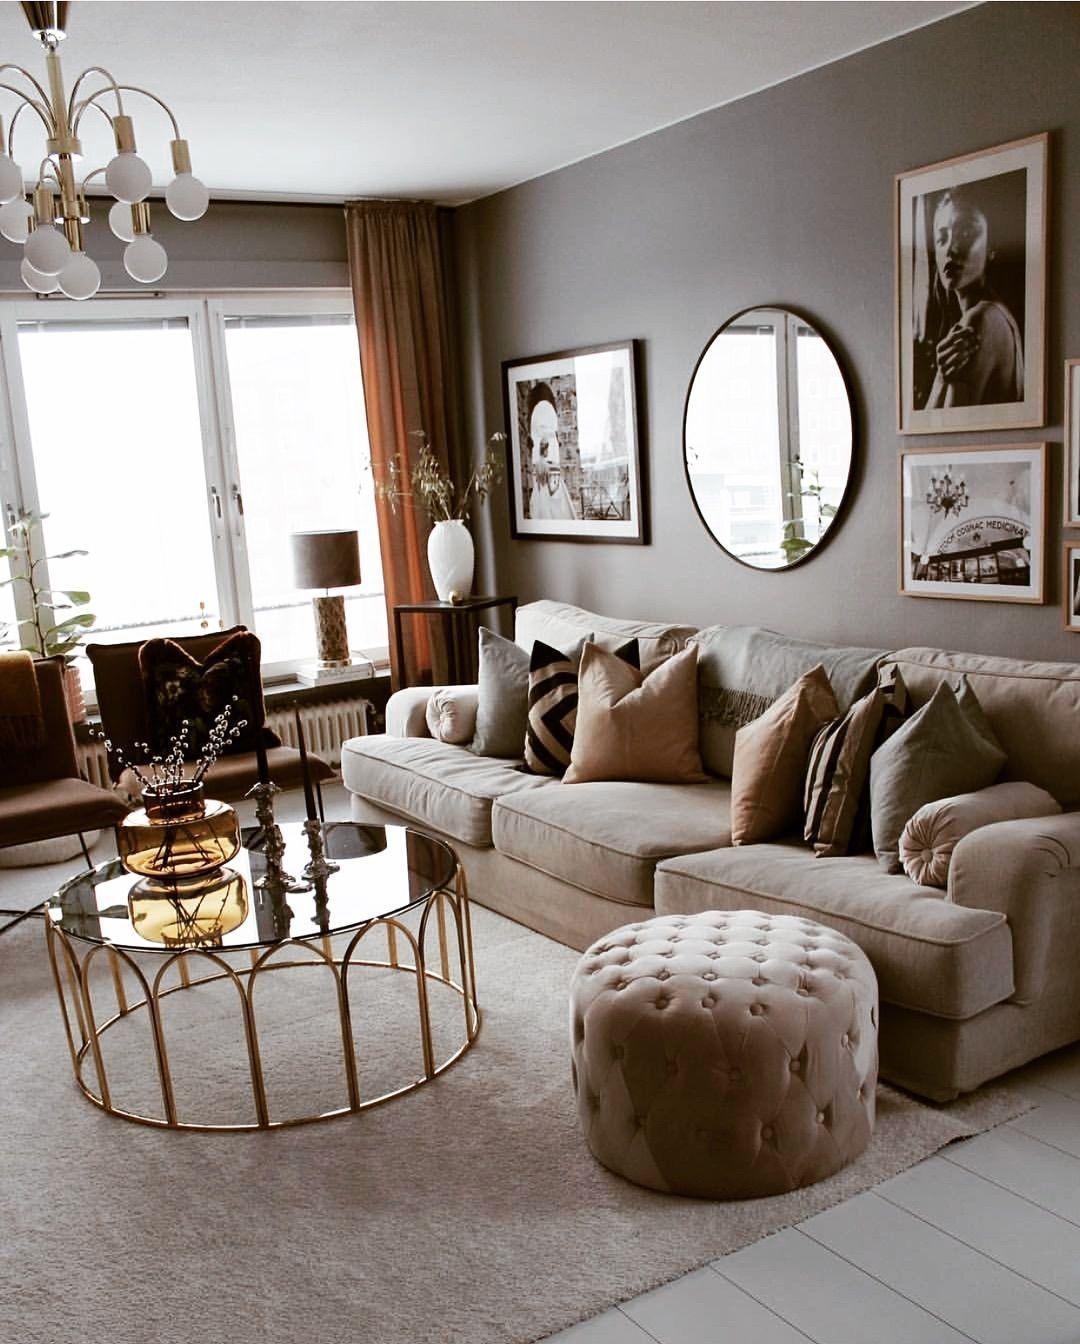 Elegant Decor New Ideas Decor Elegantes Elegant Decor Living Room Decor Ide Living Room Decor Apartment Small Living Room Decor Living Room Decor Modern